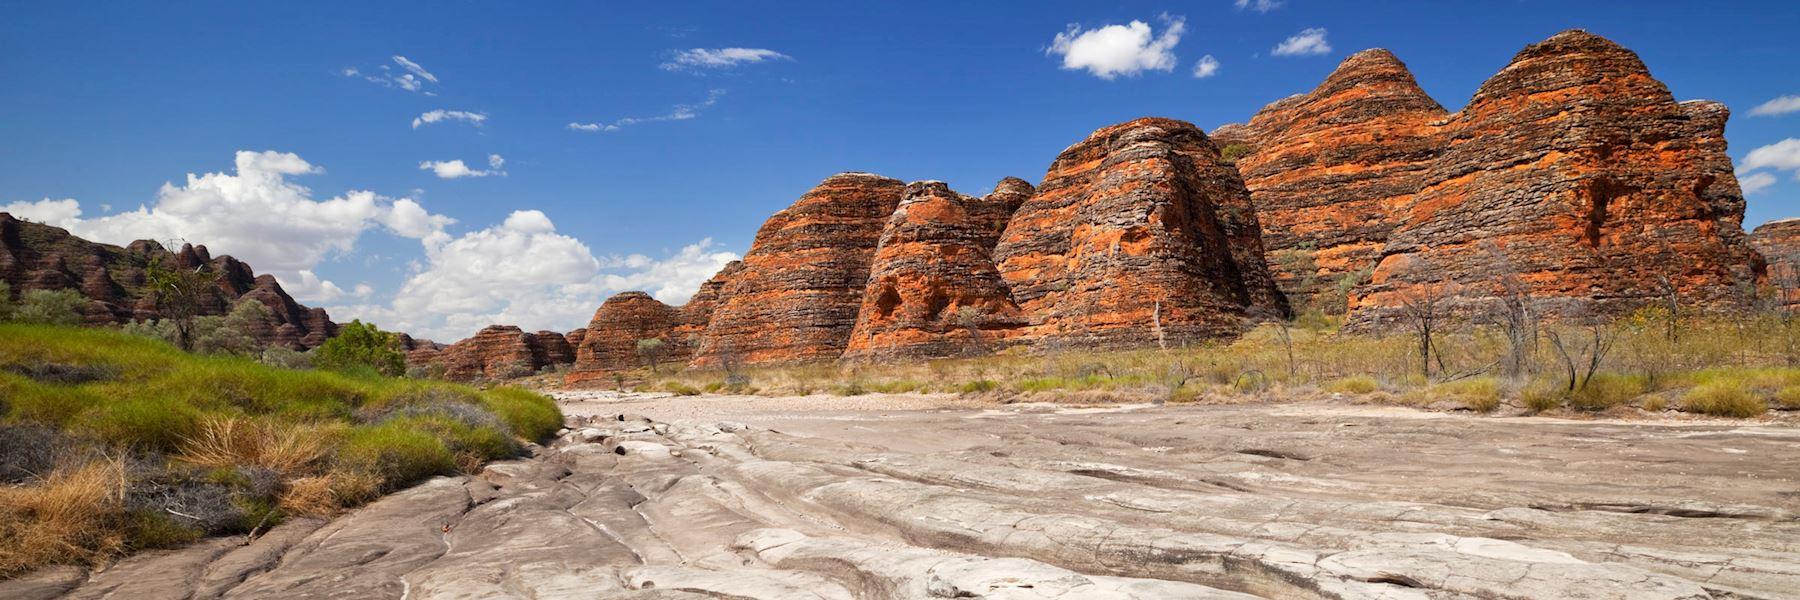 Visit Purnululu (Bungle Bungle) National Park, Australia